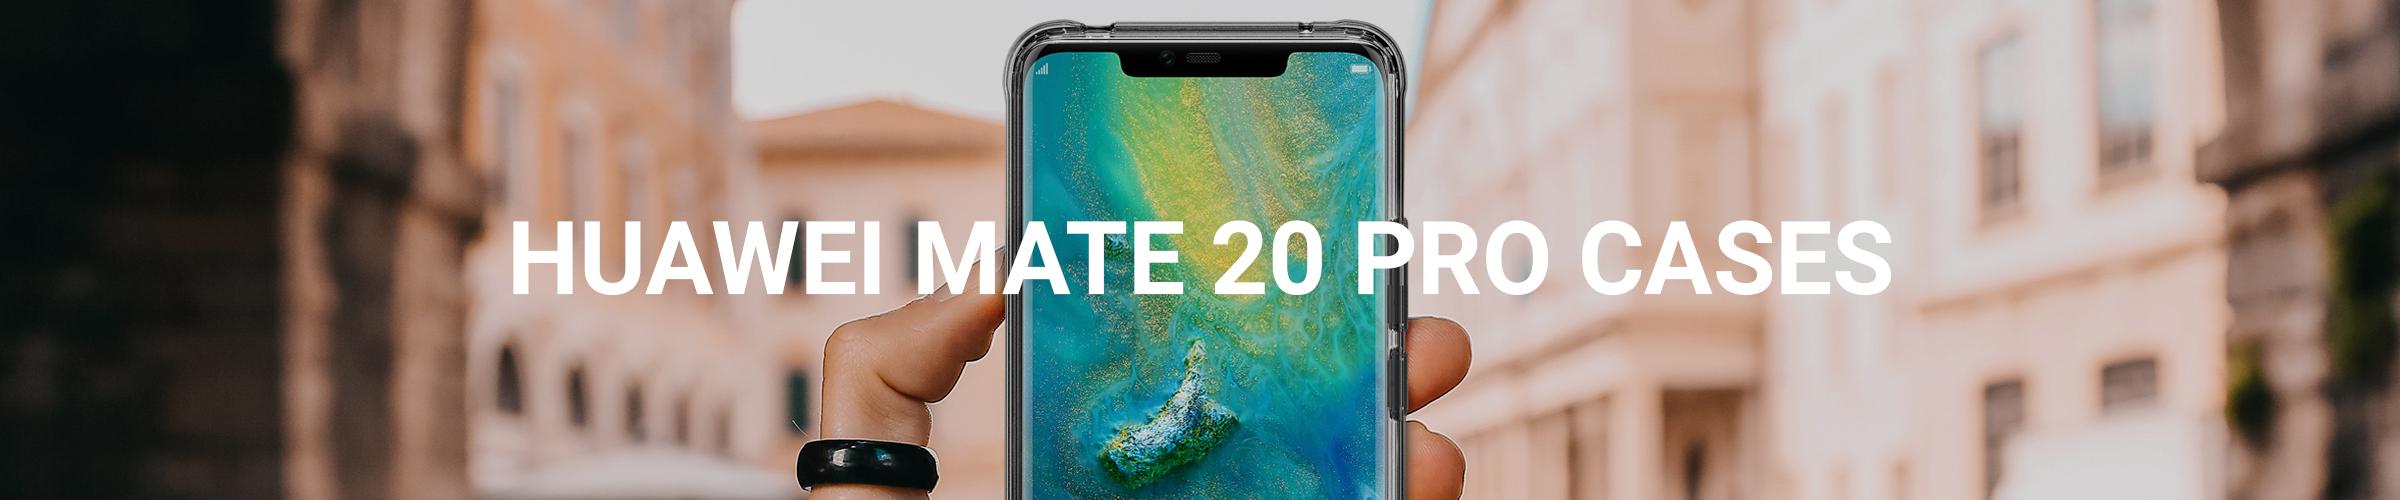 Huawei Mate 20 Pro Etuier